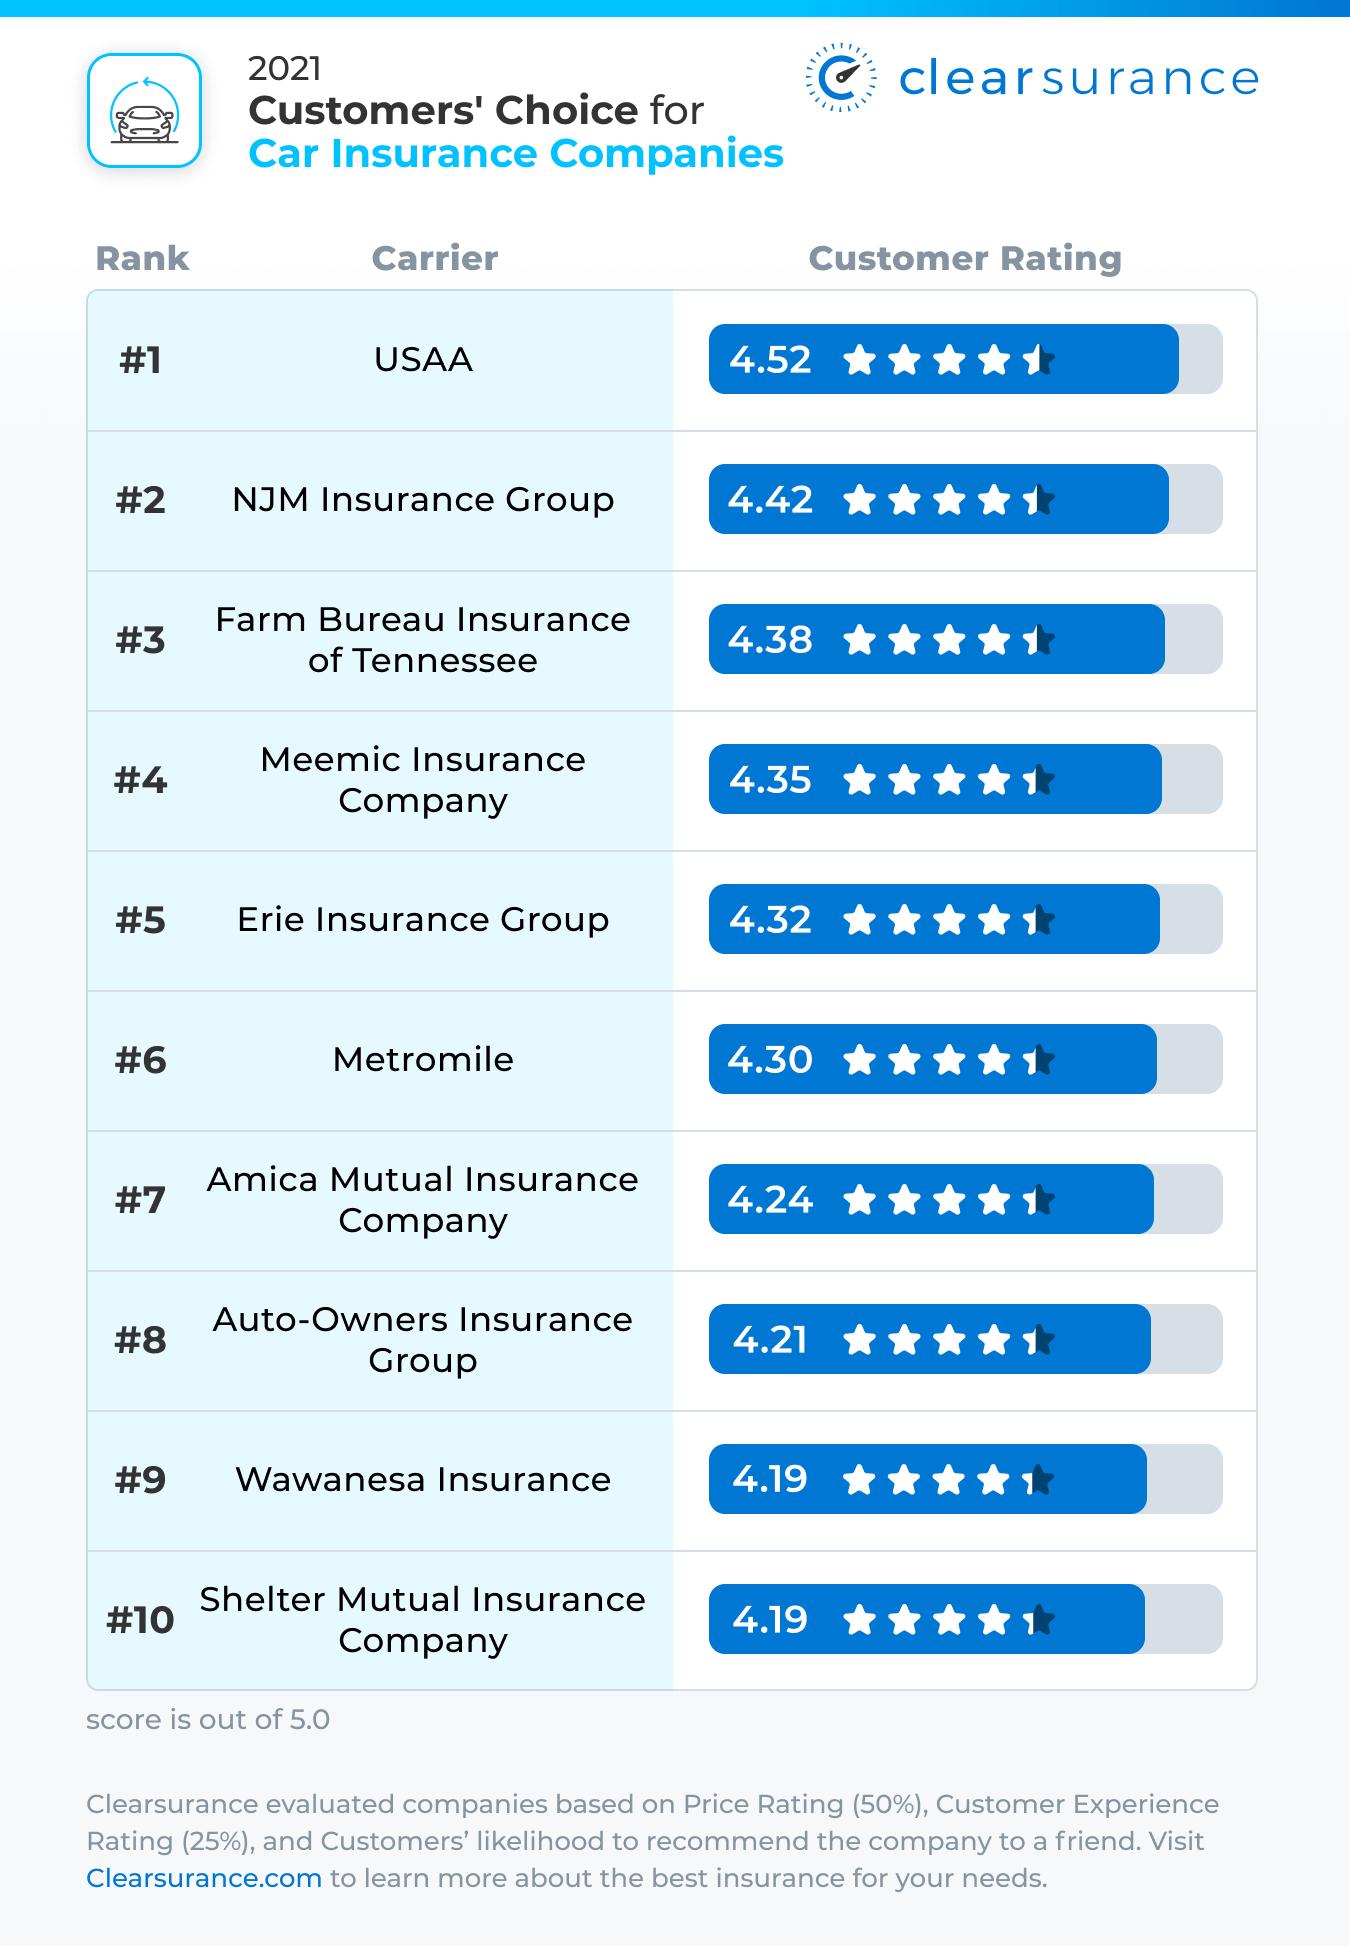 2021 Customers' Choice Best Car Insurance Companies